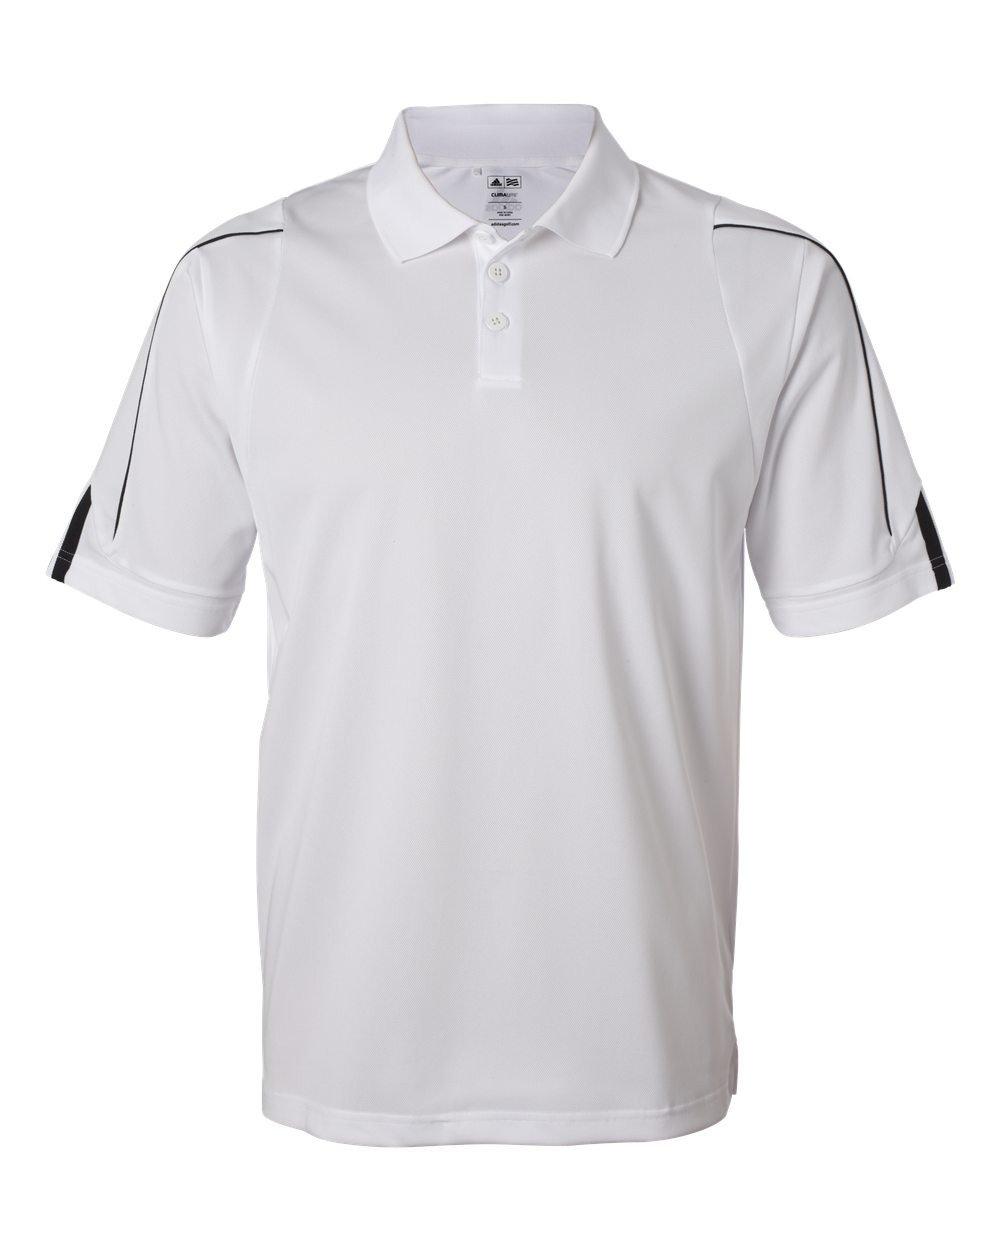 adidas Men's Climalite 3-Stripes Cuff Piqué Polo (White/Black) (Small)